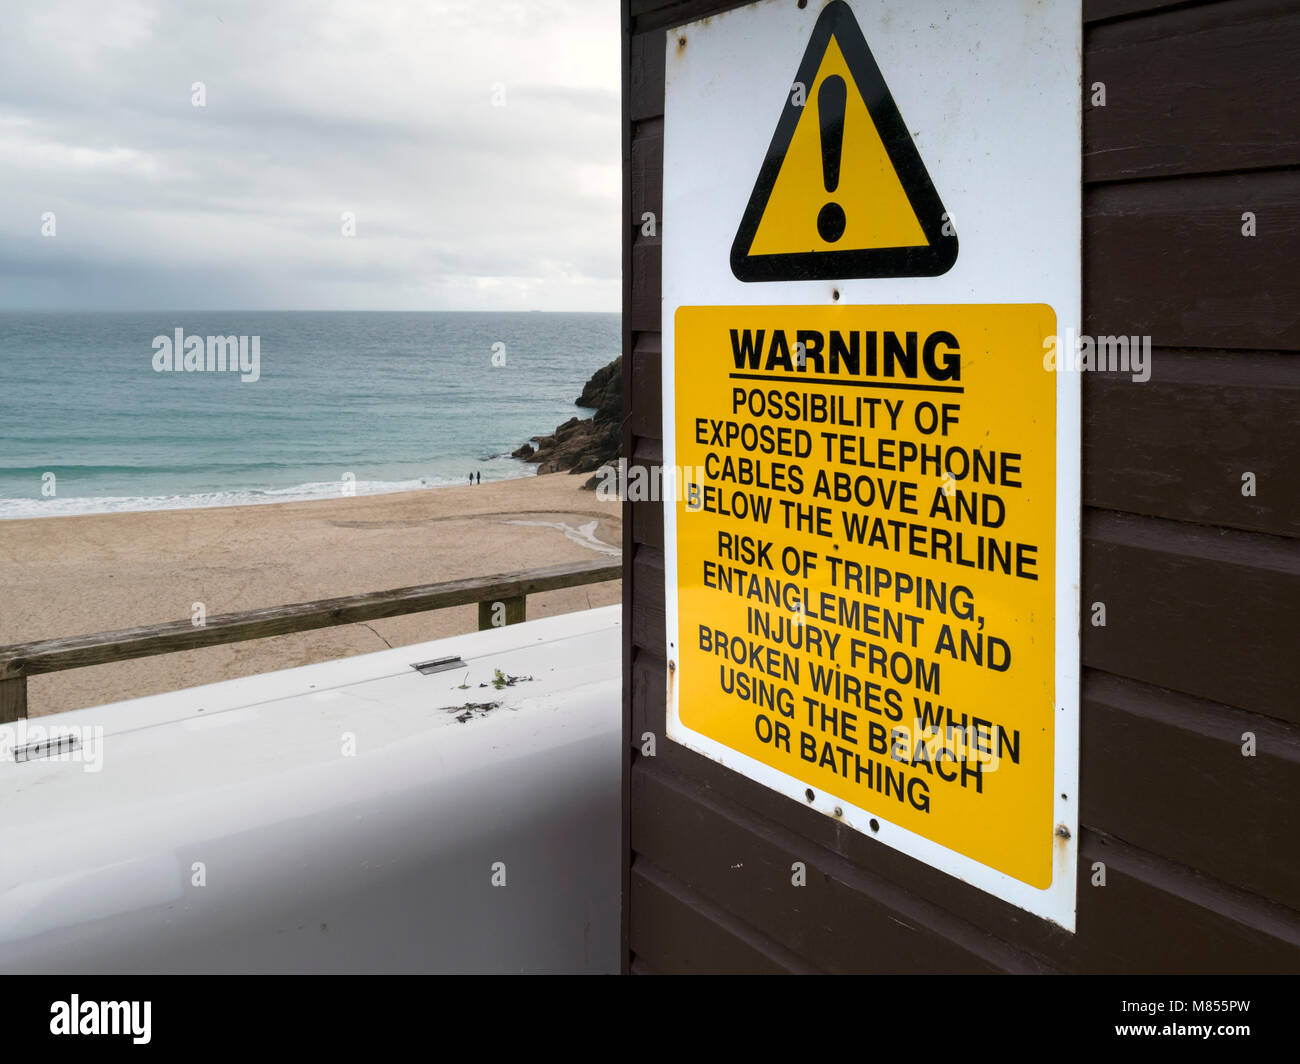 Warning sign about dangers of underwater, underground